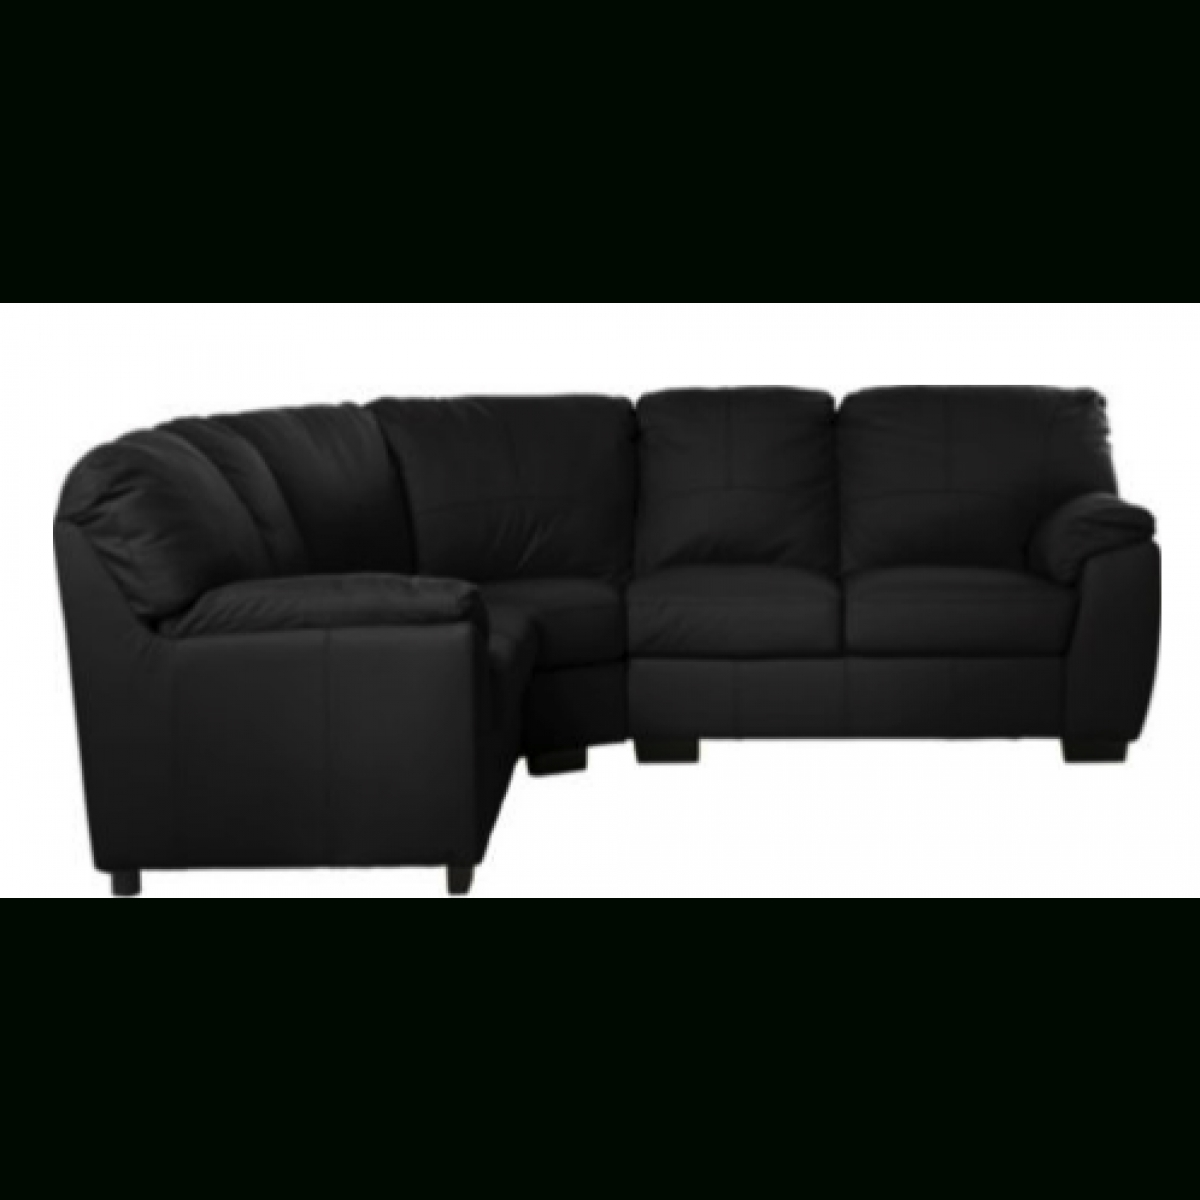 Milano Leather Dual Facing Corner Sofa Group – Black – Furnico Village In Black Corner Sofas (Image 13 of 20)